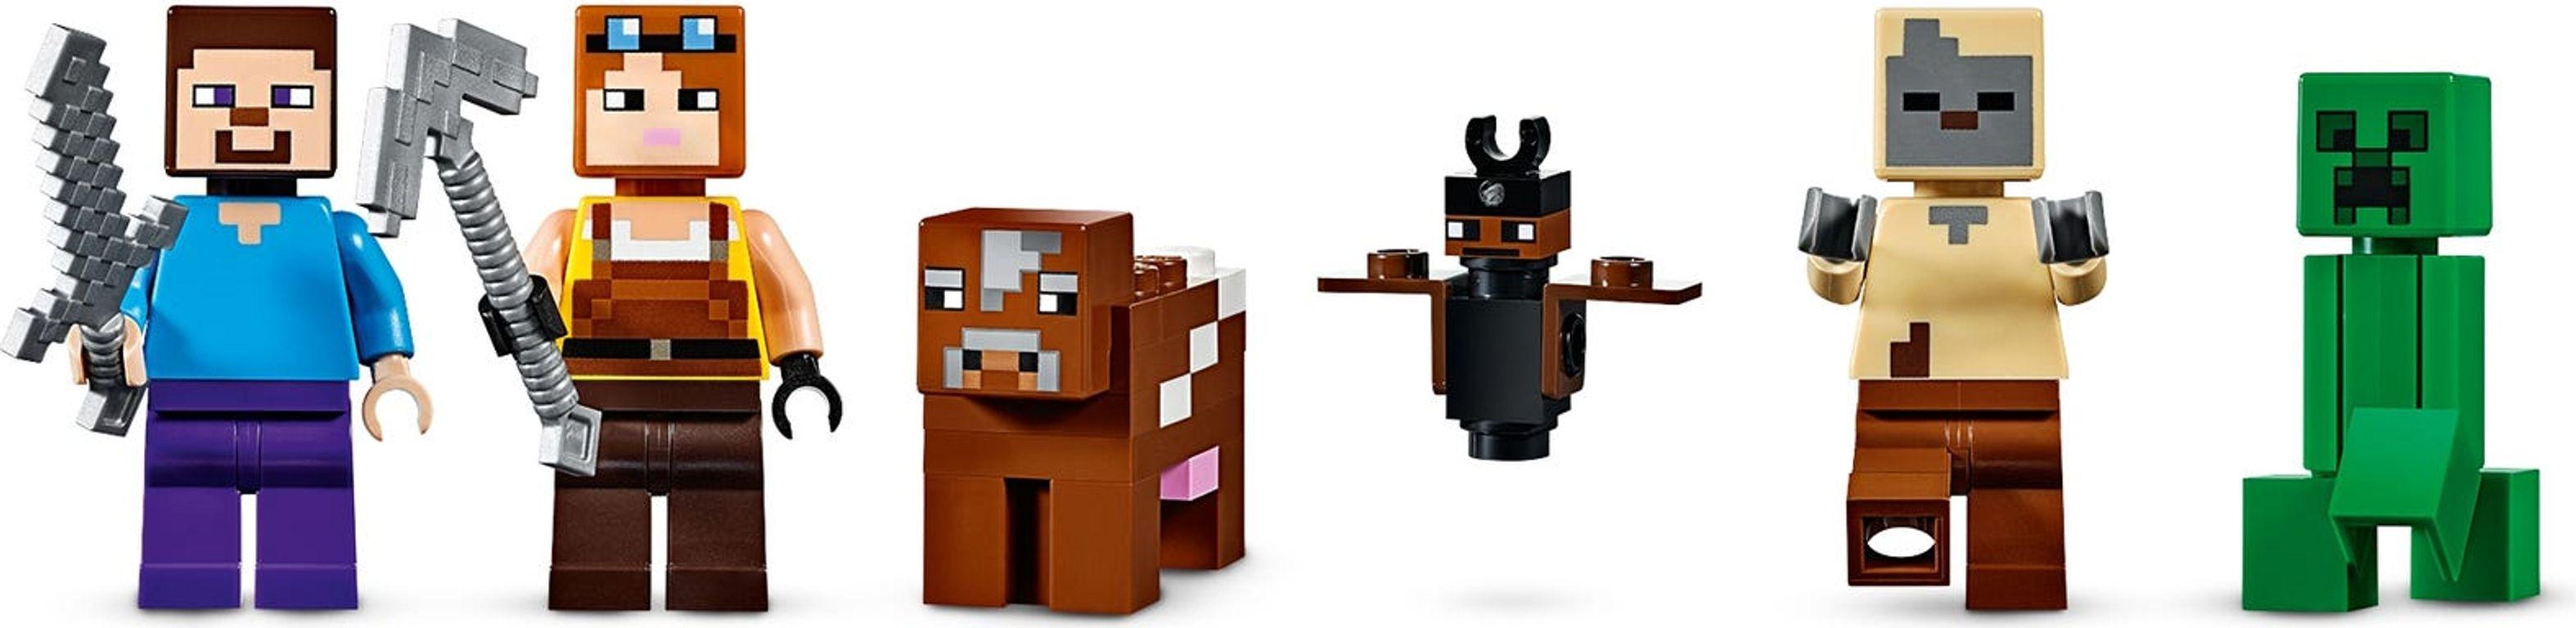 LEGO® Minecraft The Creeper™ Mine minifigures